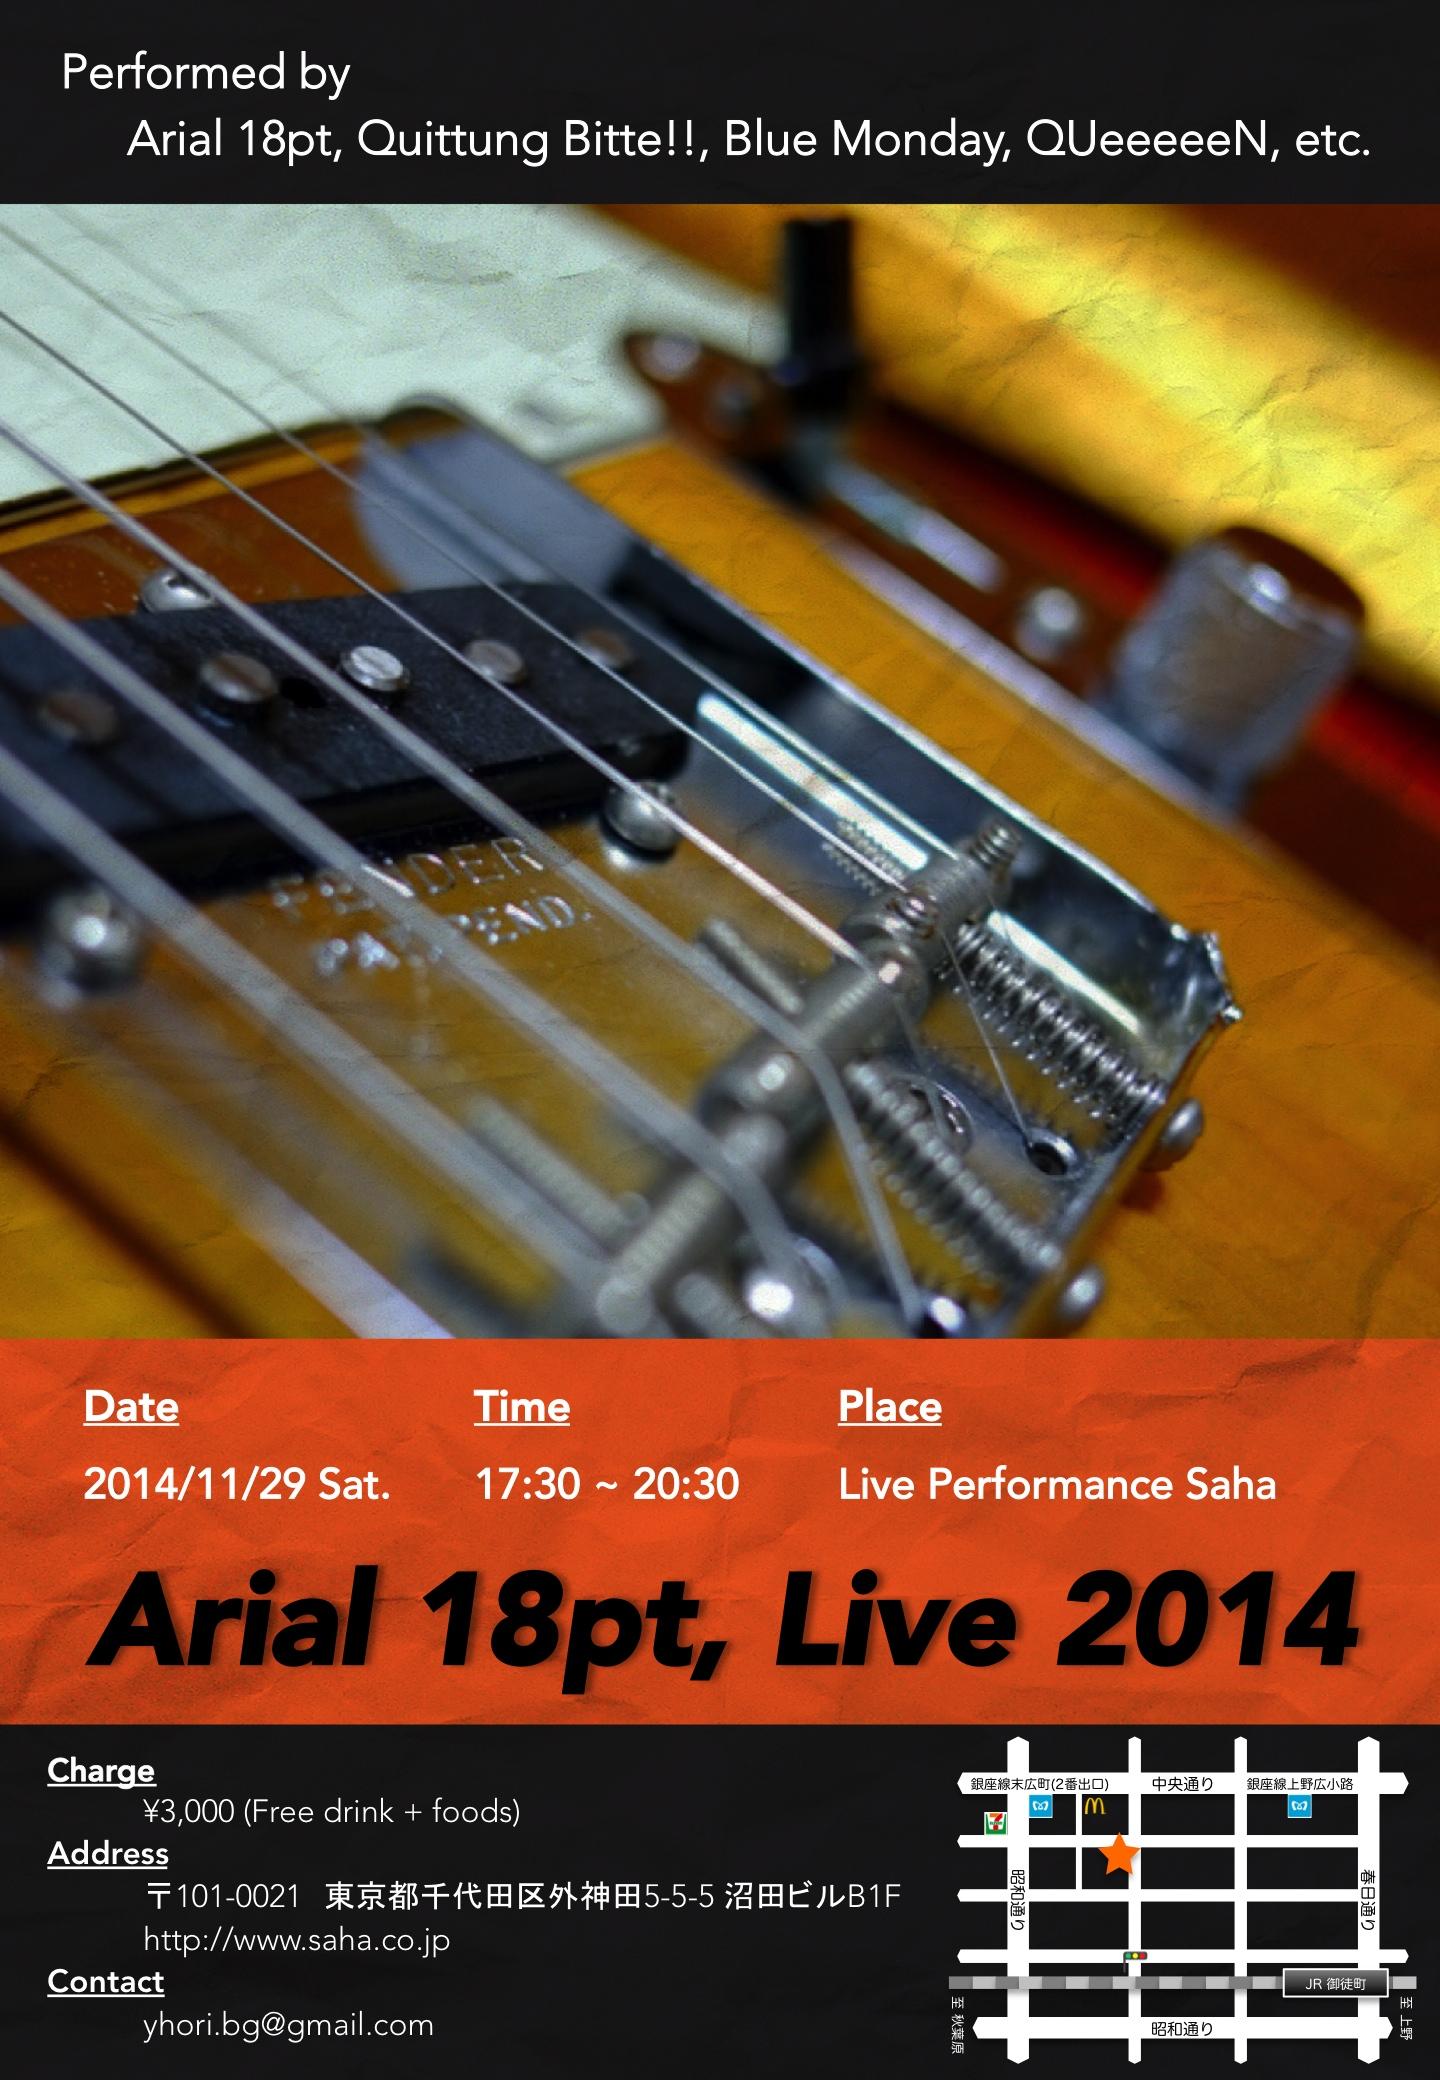 ArialLive2014